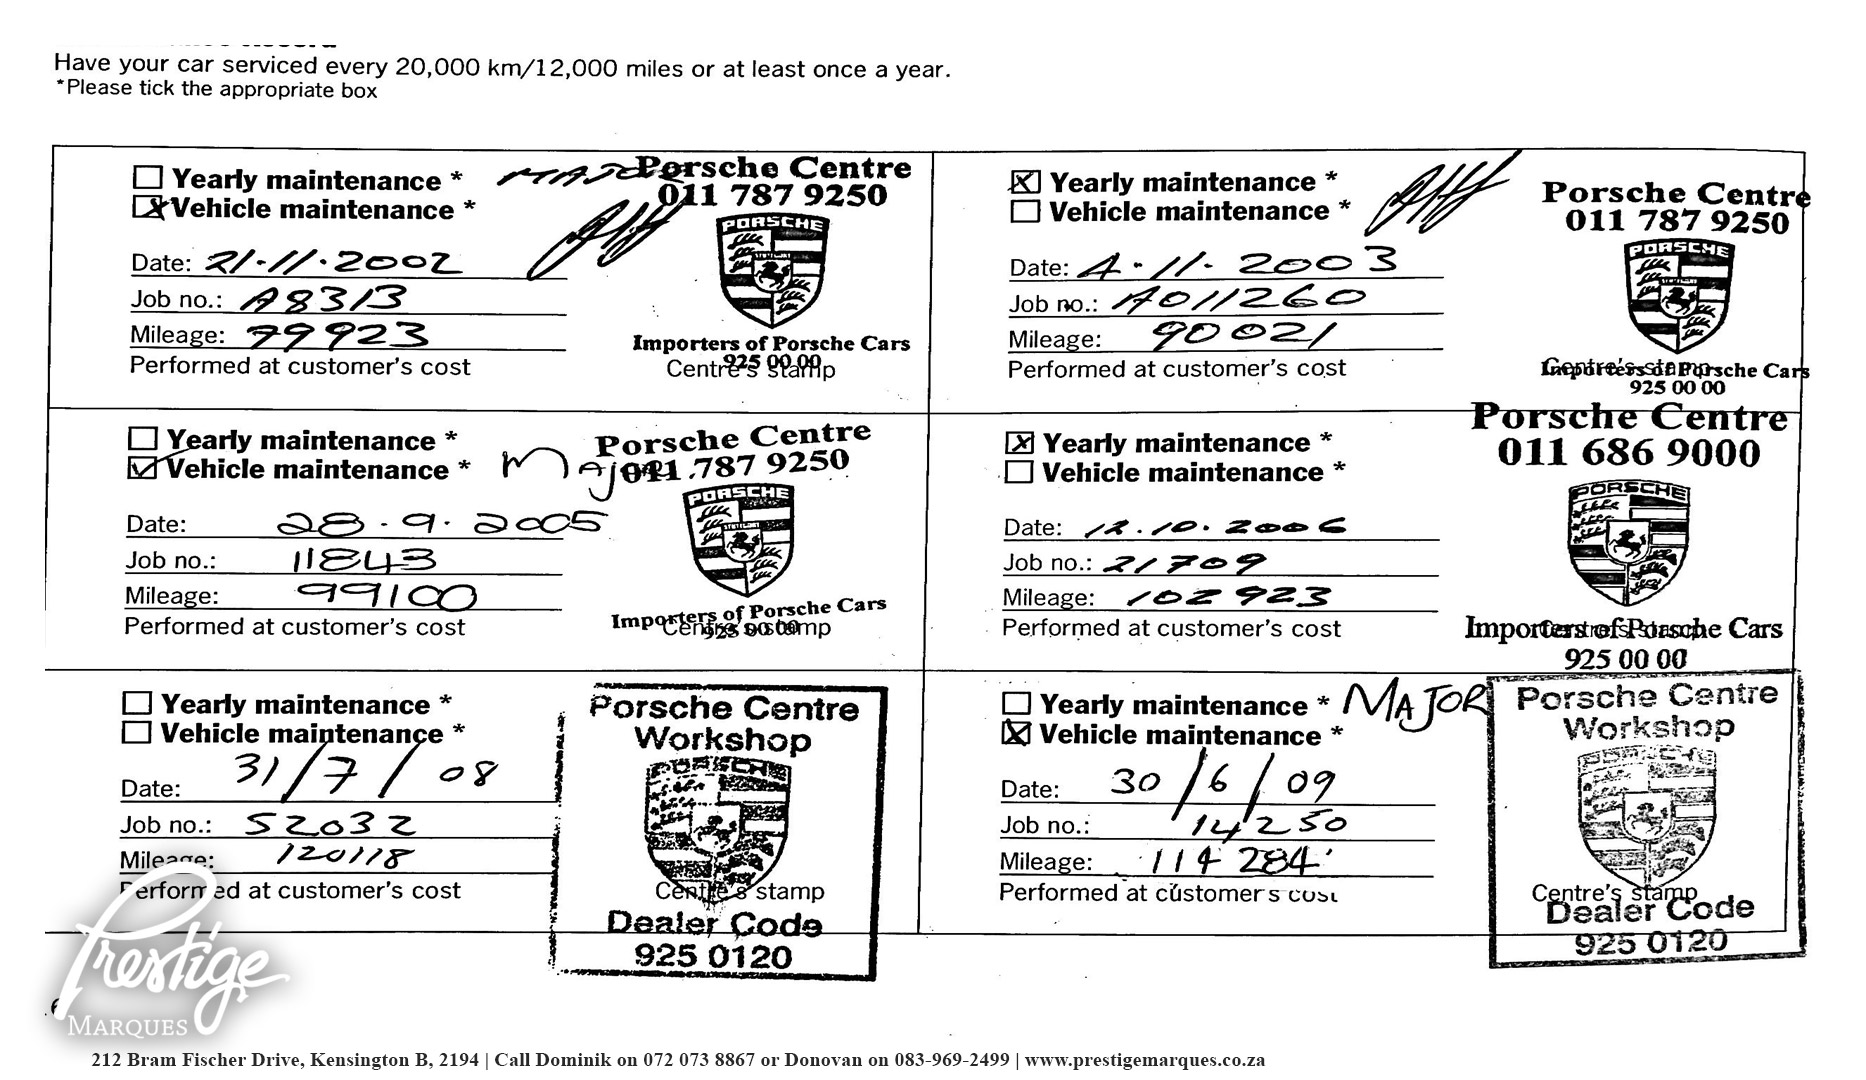 Porsche-911-993-Turbo-Prestige-Marques-Randburg-Sandton-17